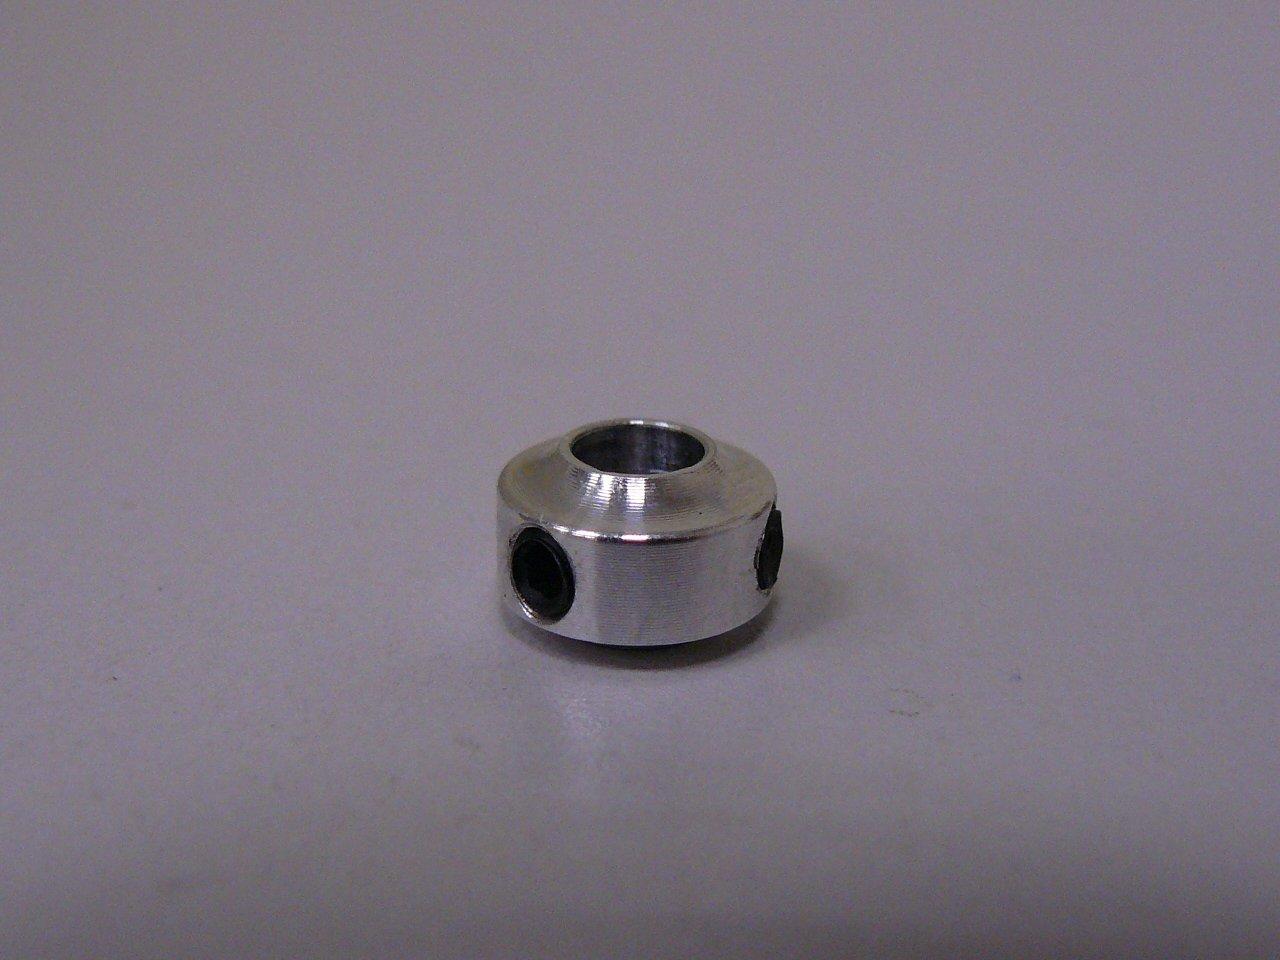 EF-7004 Skytec universal set collar for 4mm outer shafts